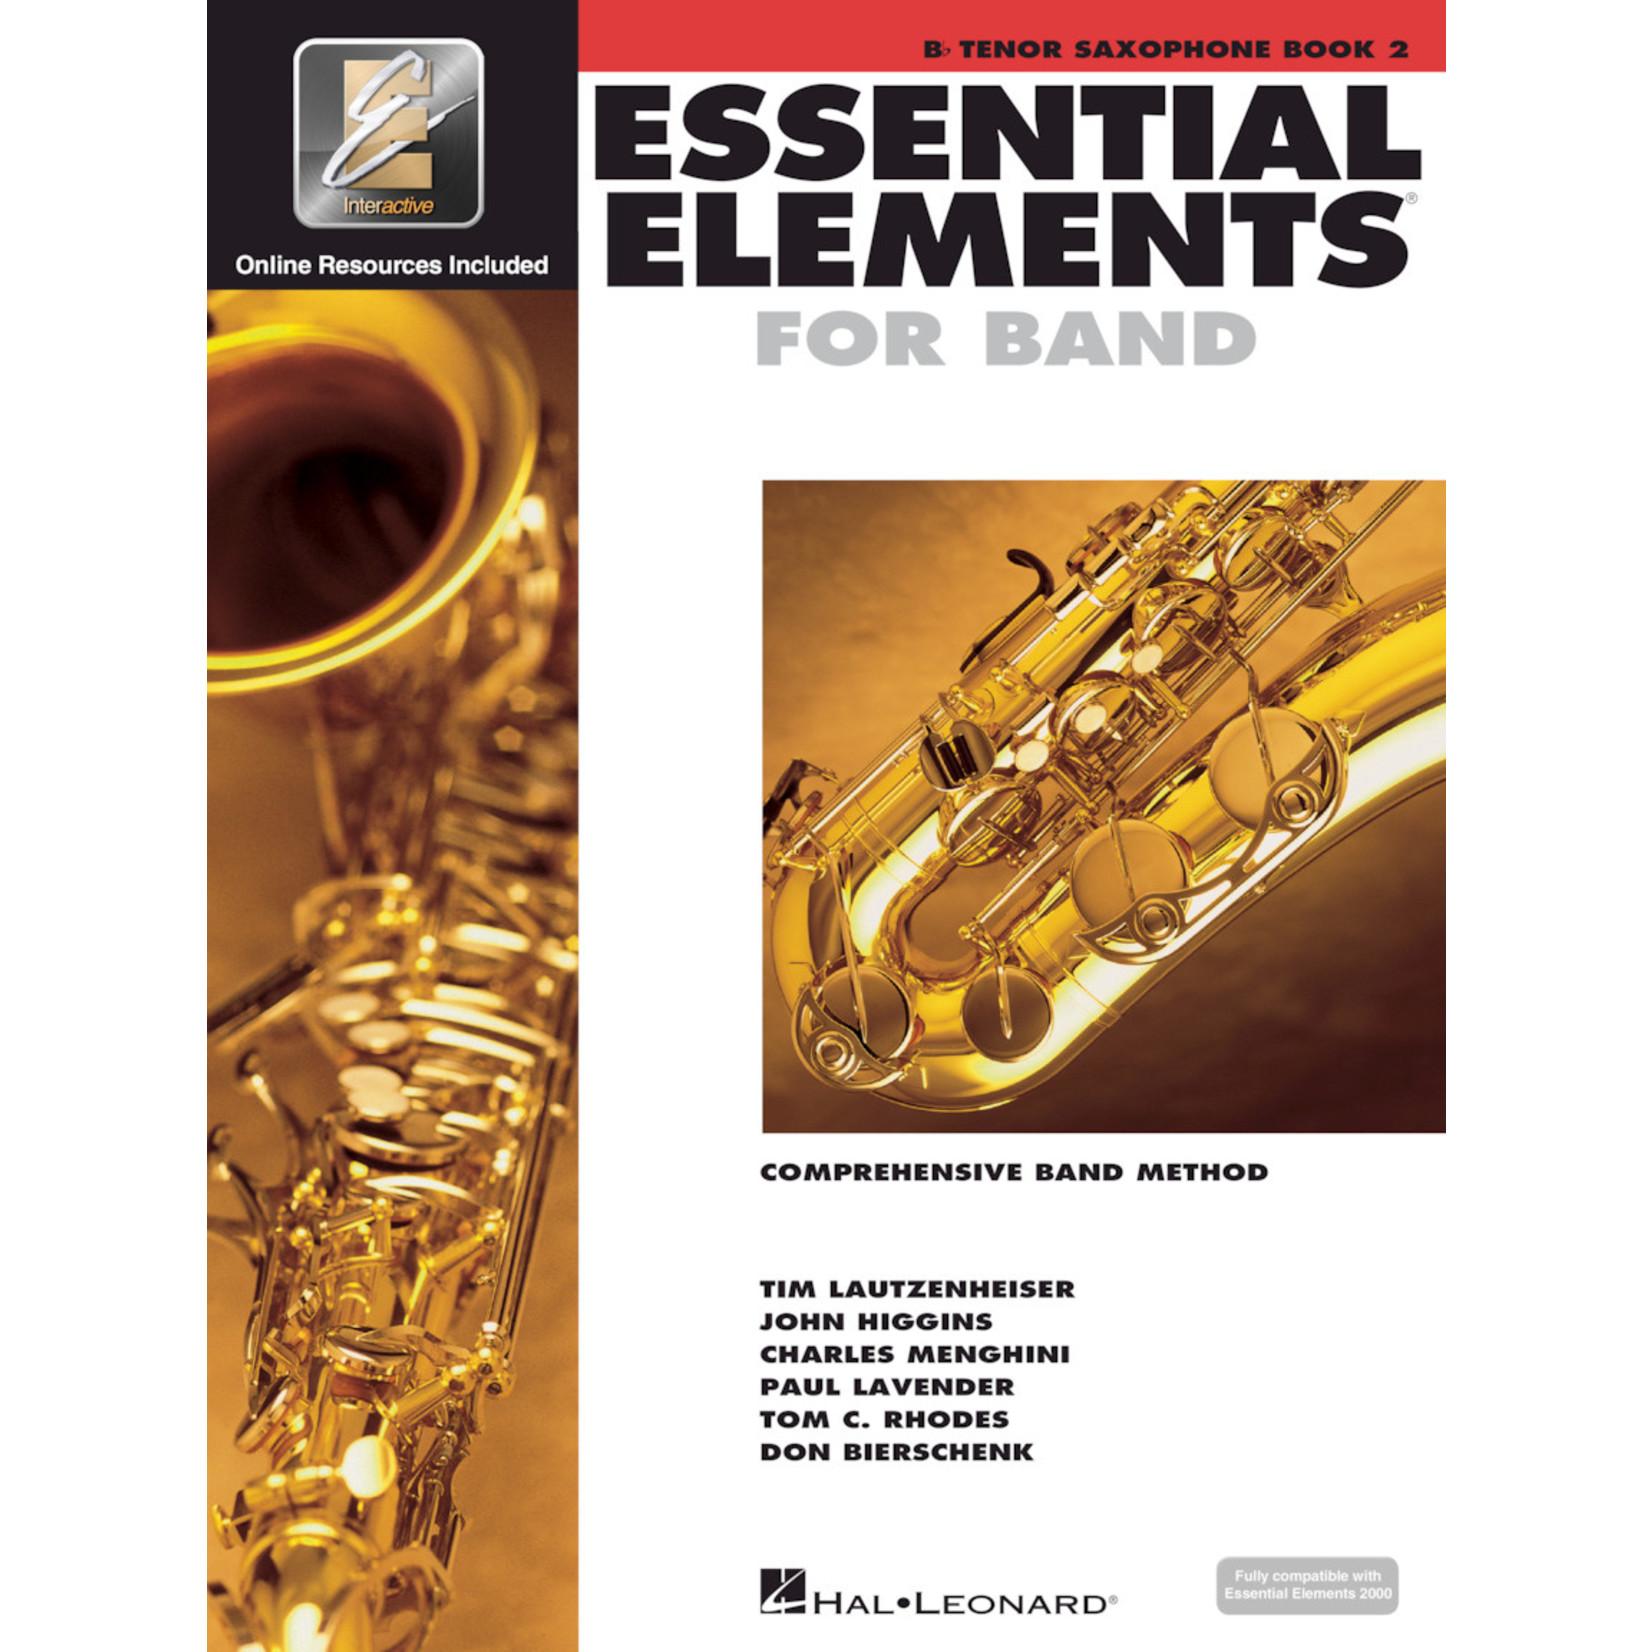 Hal Leonard Essential Elements for Band Tenor Saxophone Book 2